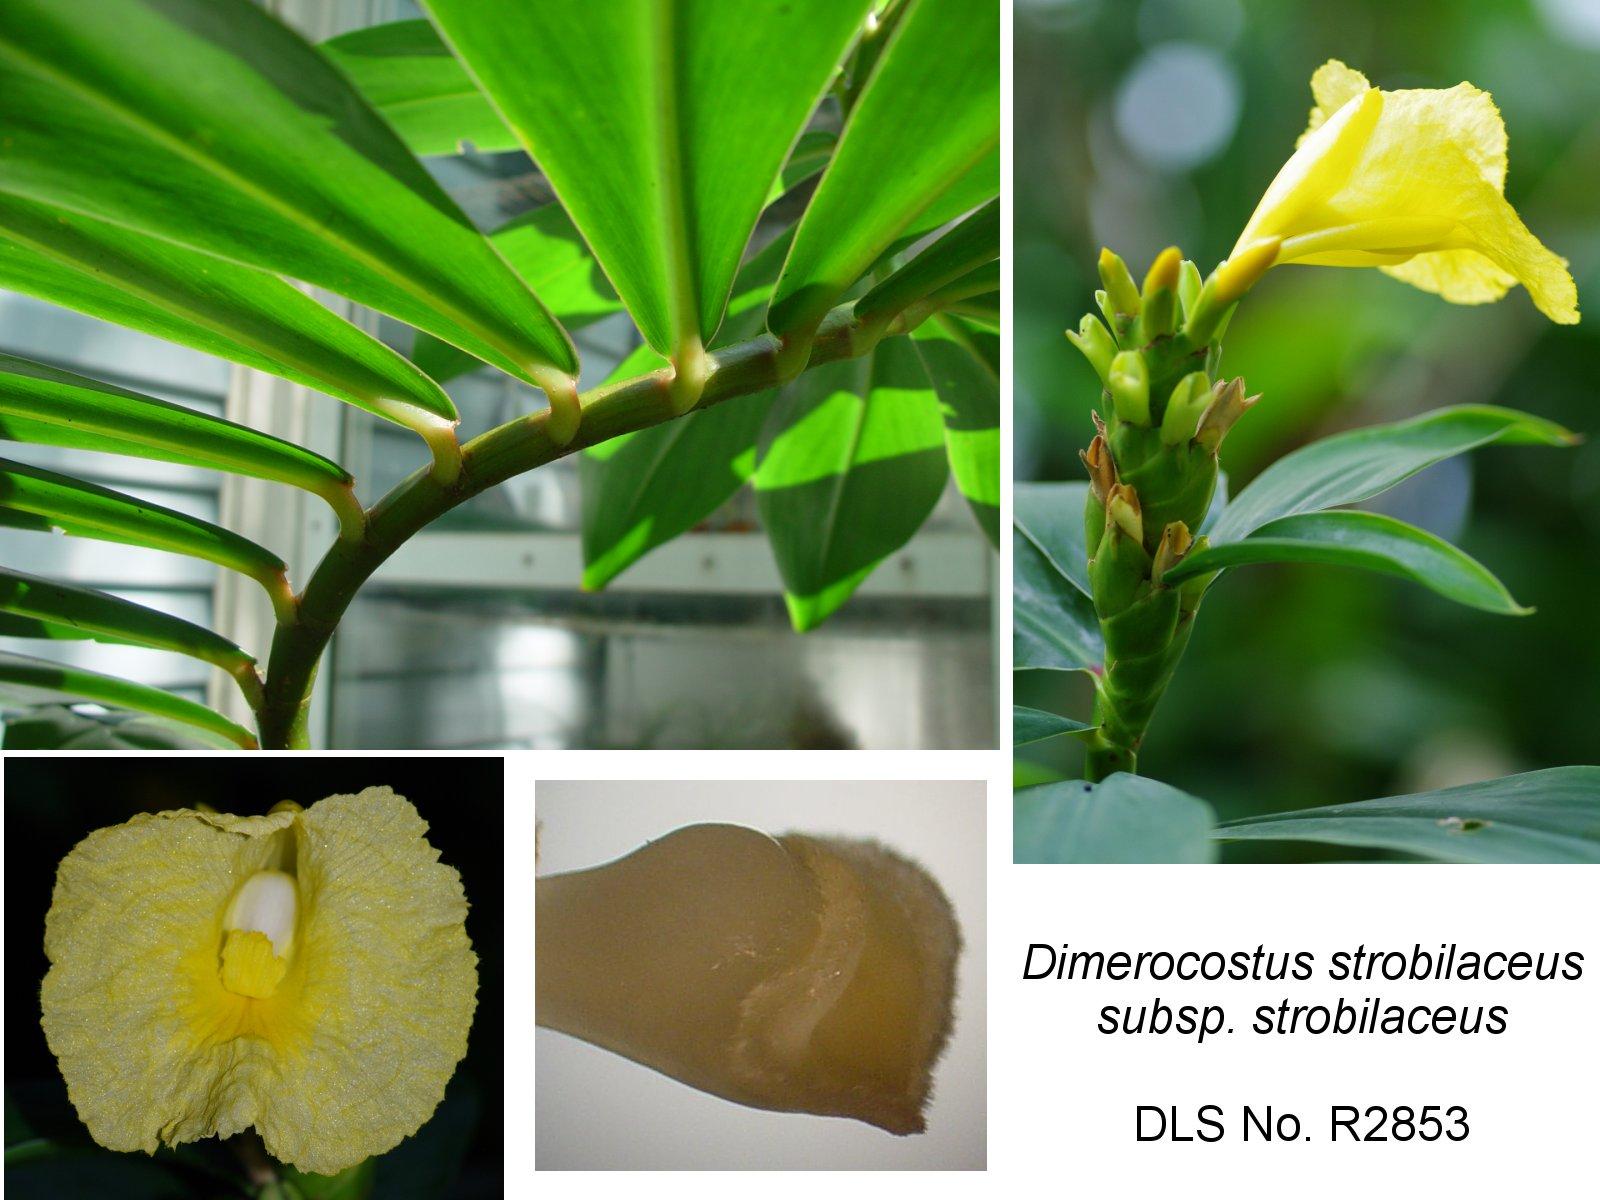 Photo# 17423 - D. strobilaceus subsp. strobilaceus, yellow flowering form from Fairchild Gardens, Miami